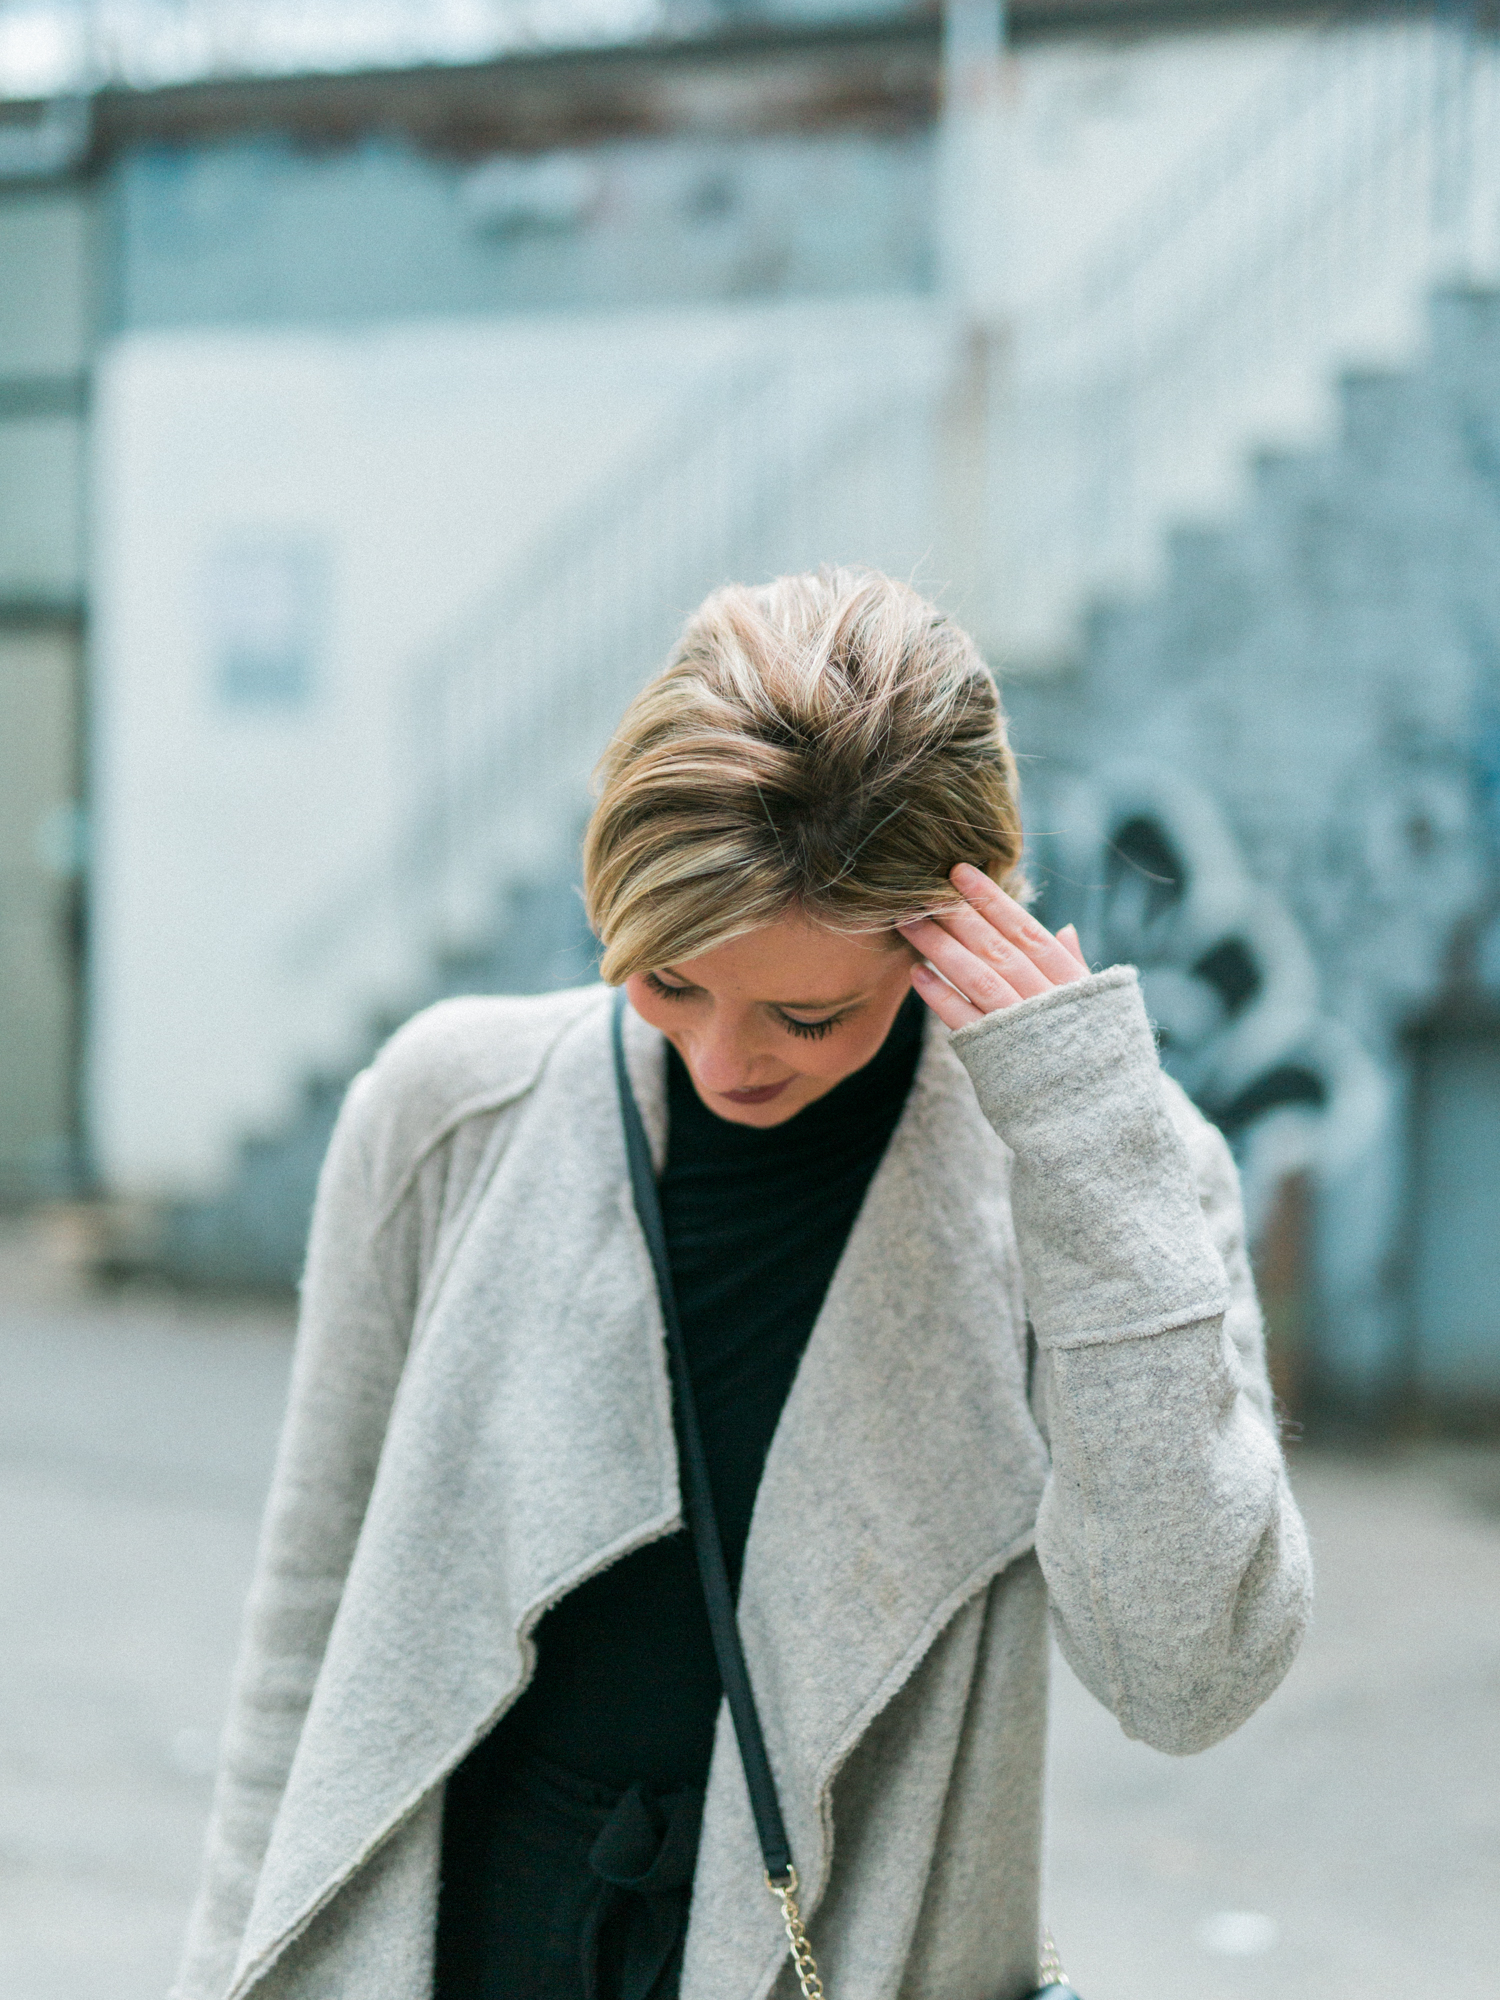 DanielleGirouxPhotography_Toronto_Portrait_StreetPhotography_0C6A1157.jpg